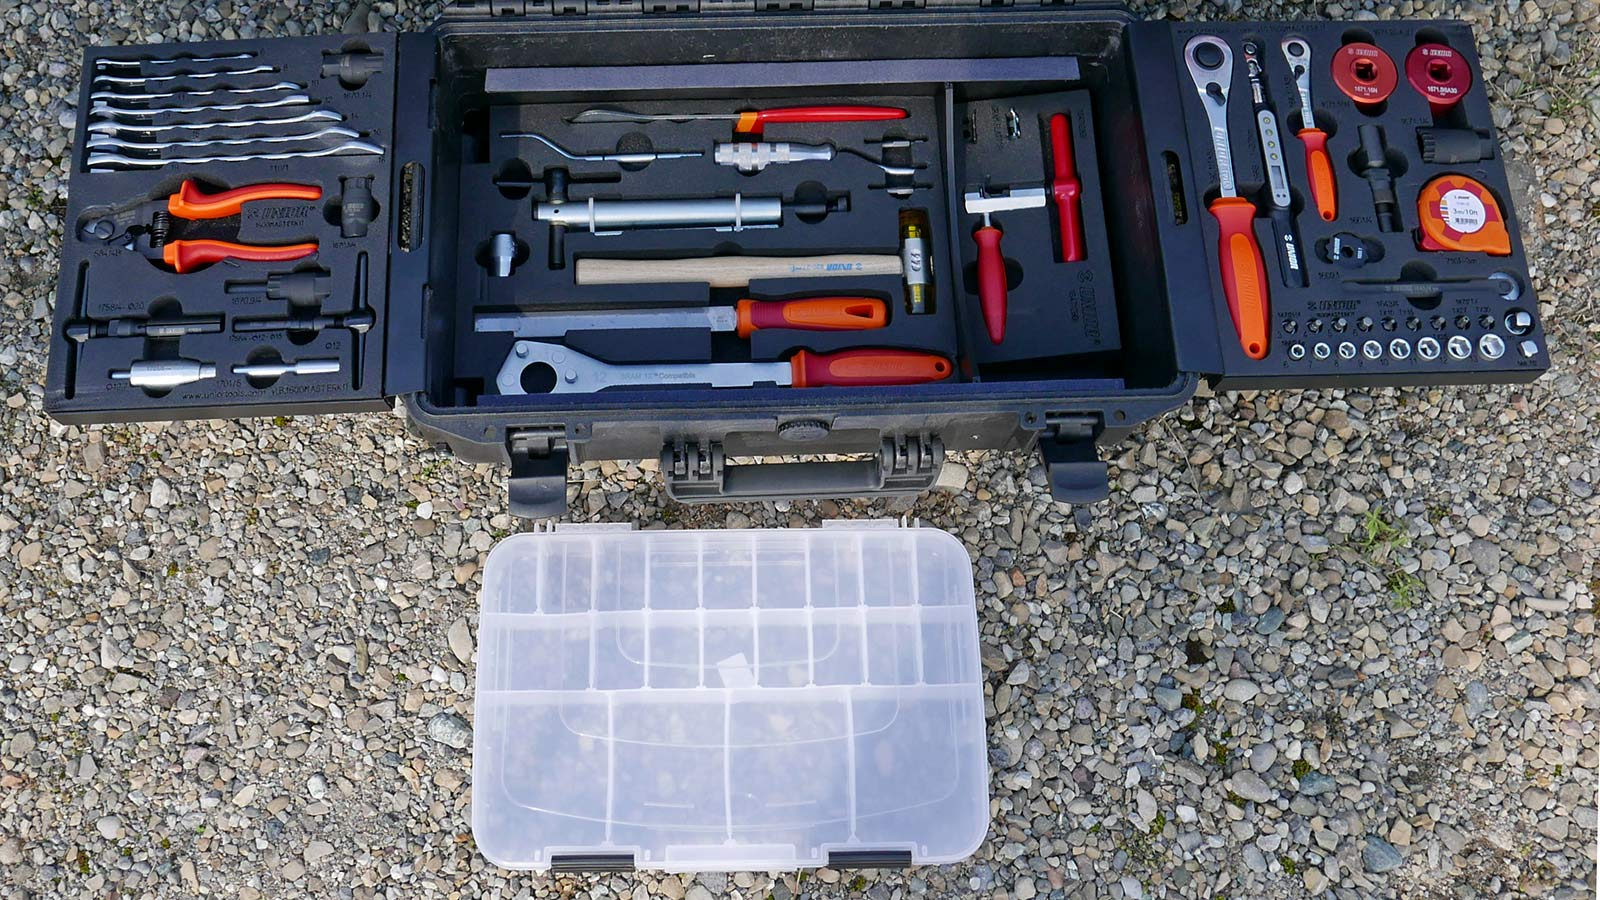 Unior Master Kit professional bike mechanic travel toolbox made in Europe, lower deck